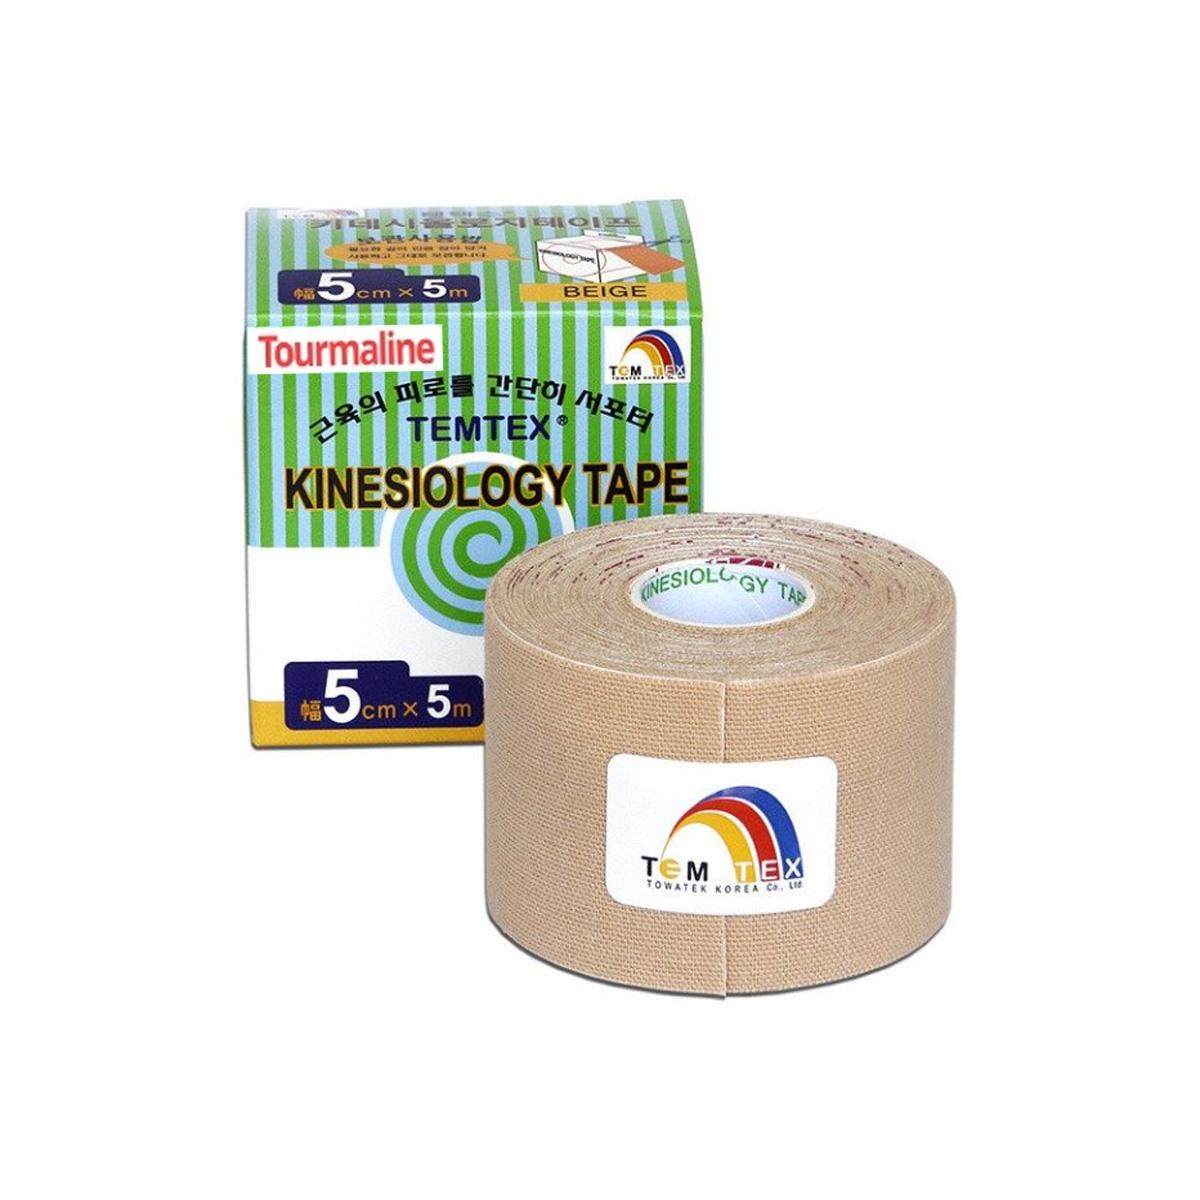 Temtex kinesio tape Tourmaline béžová 5cm x 5m